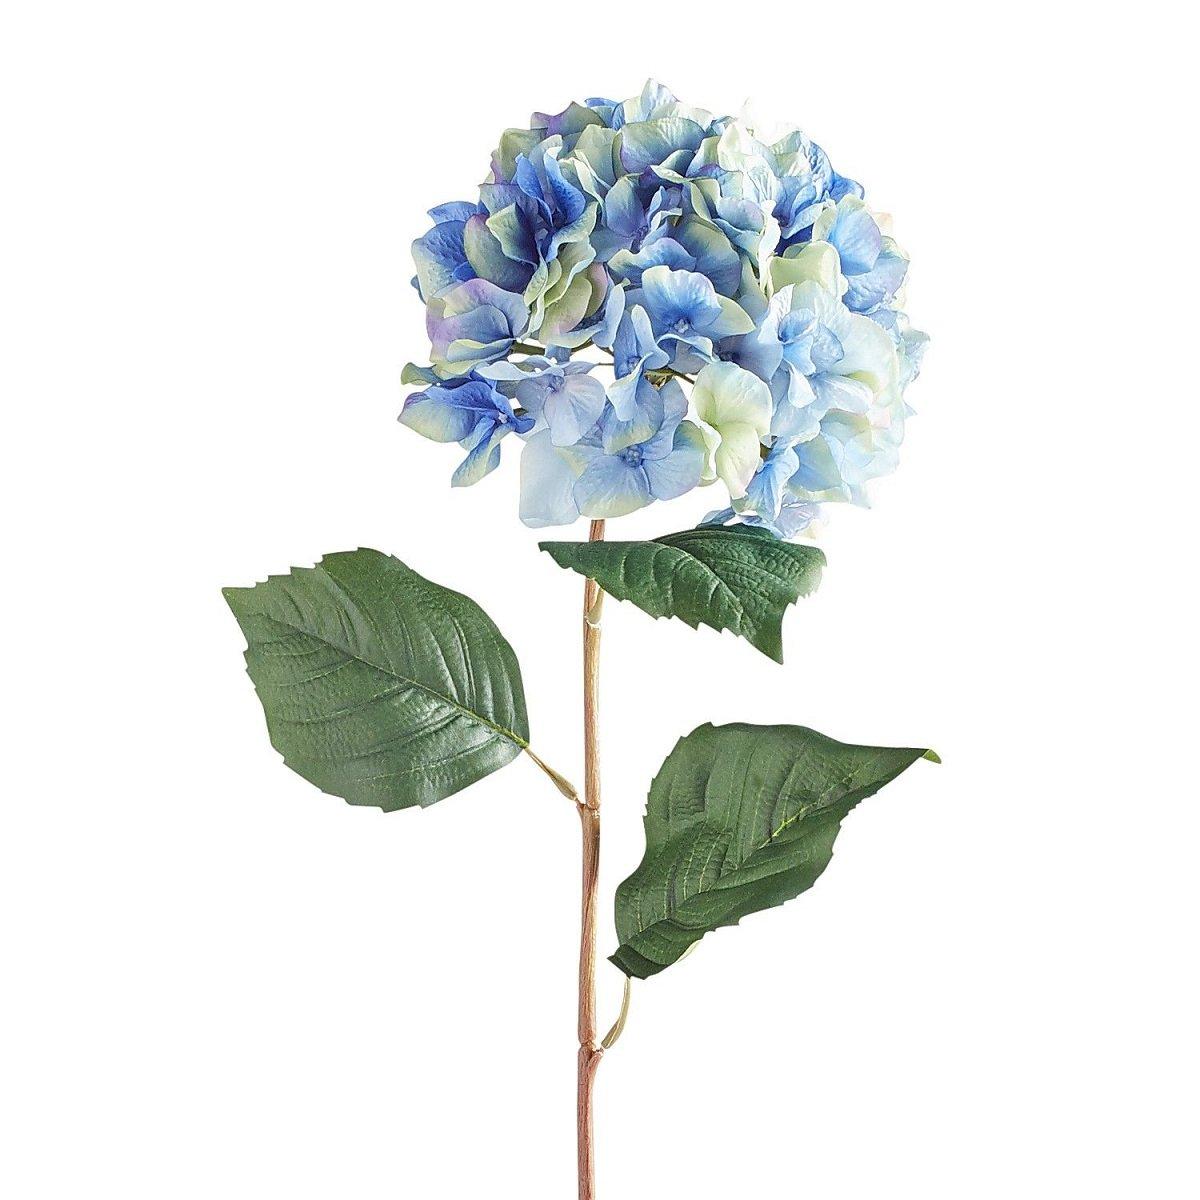 Flor en Tallo Hydrangeas Pring Blue Pier 1 Imports